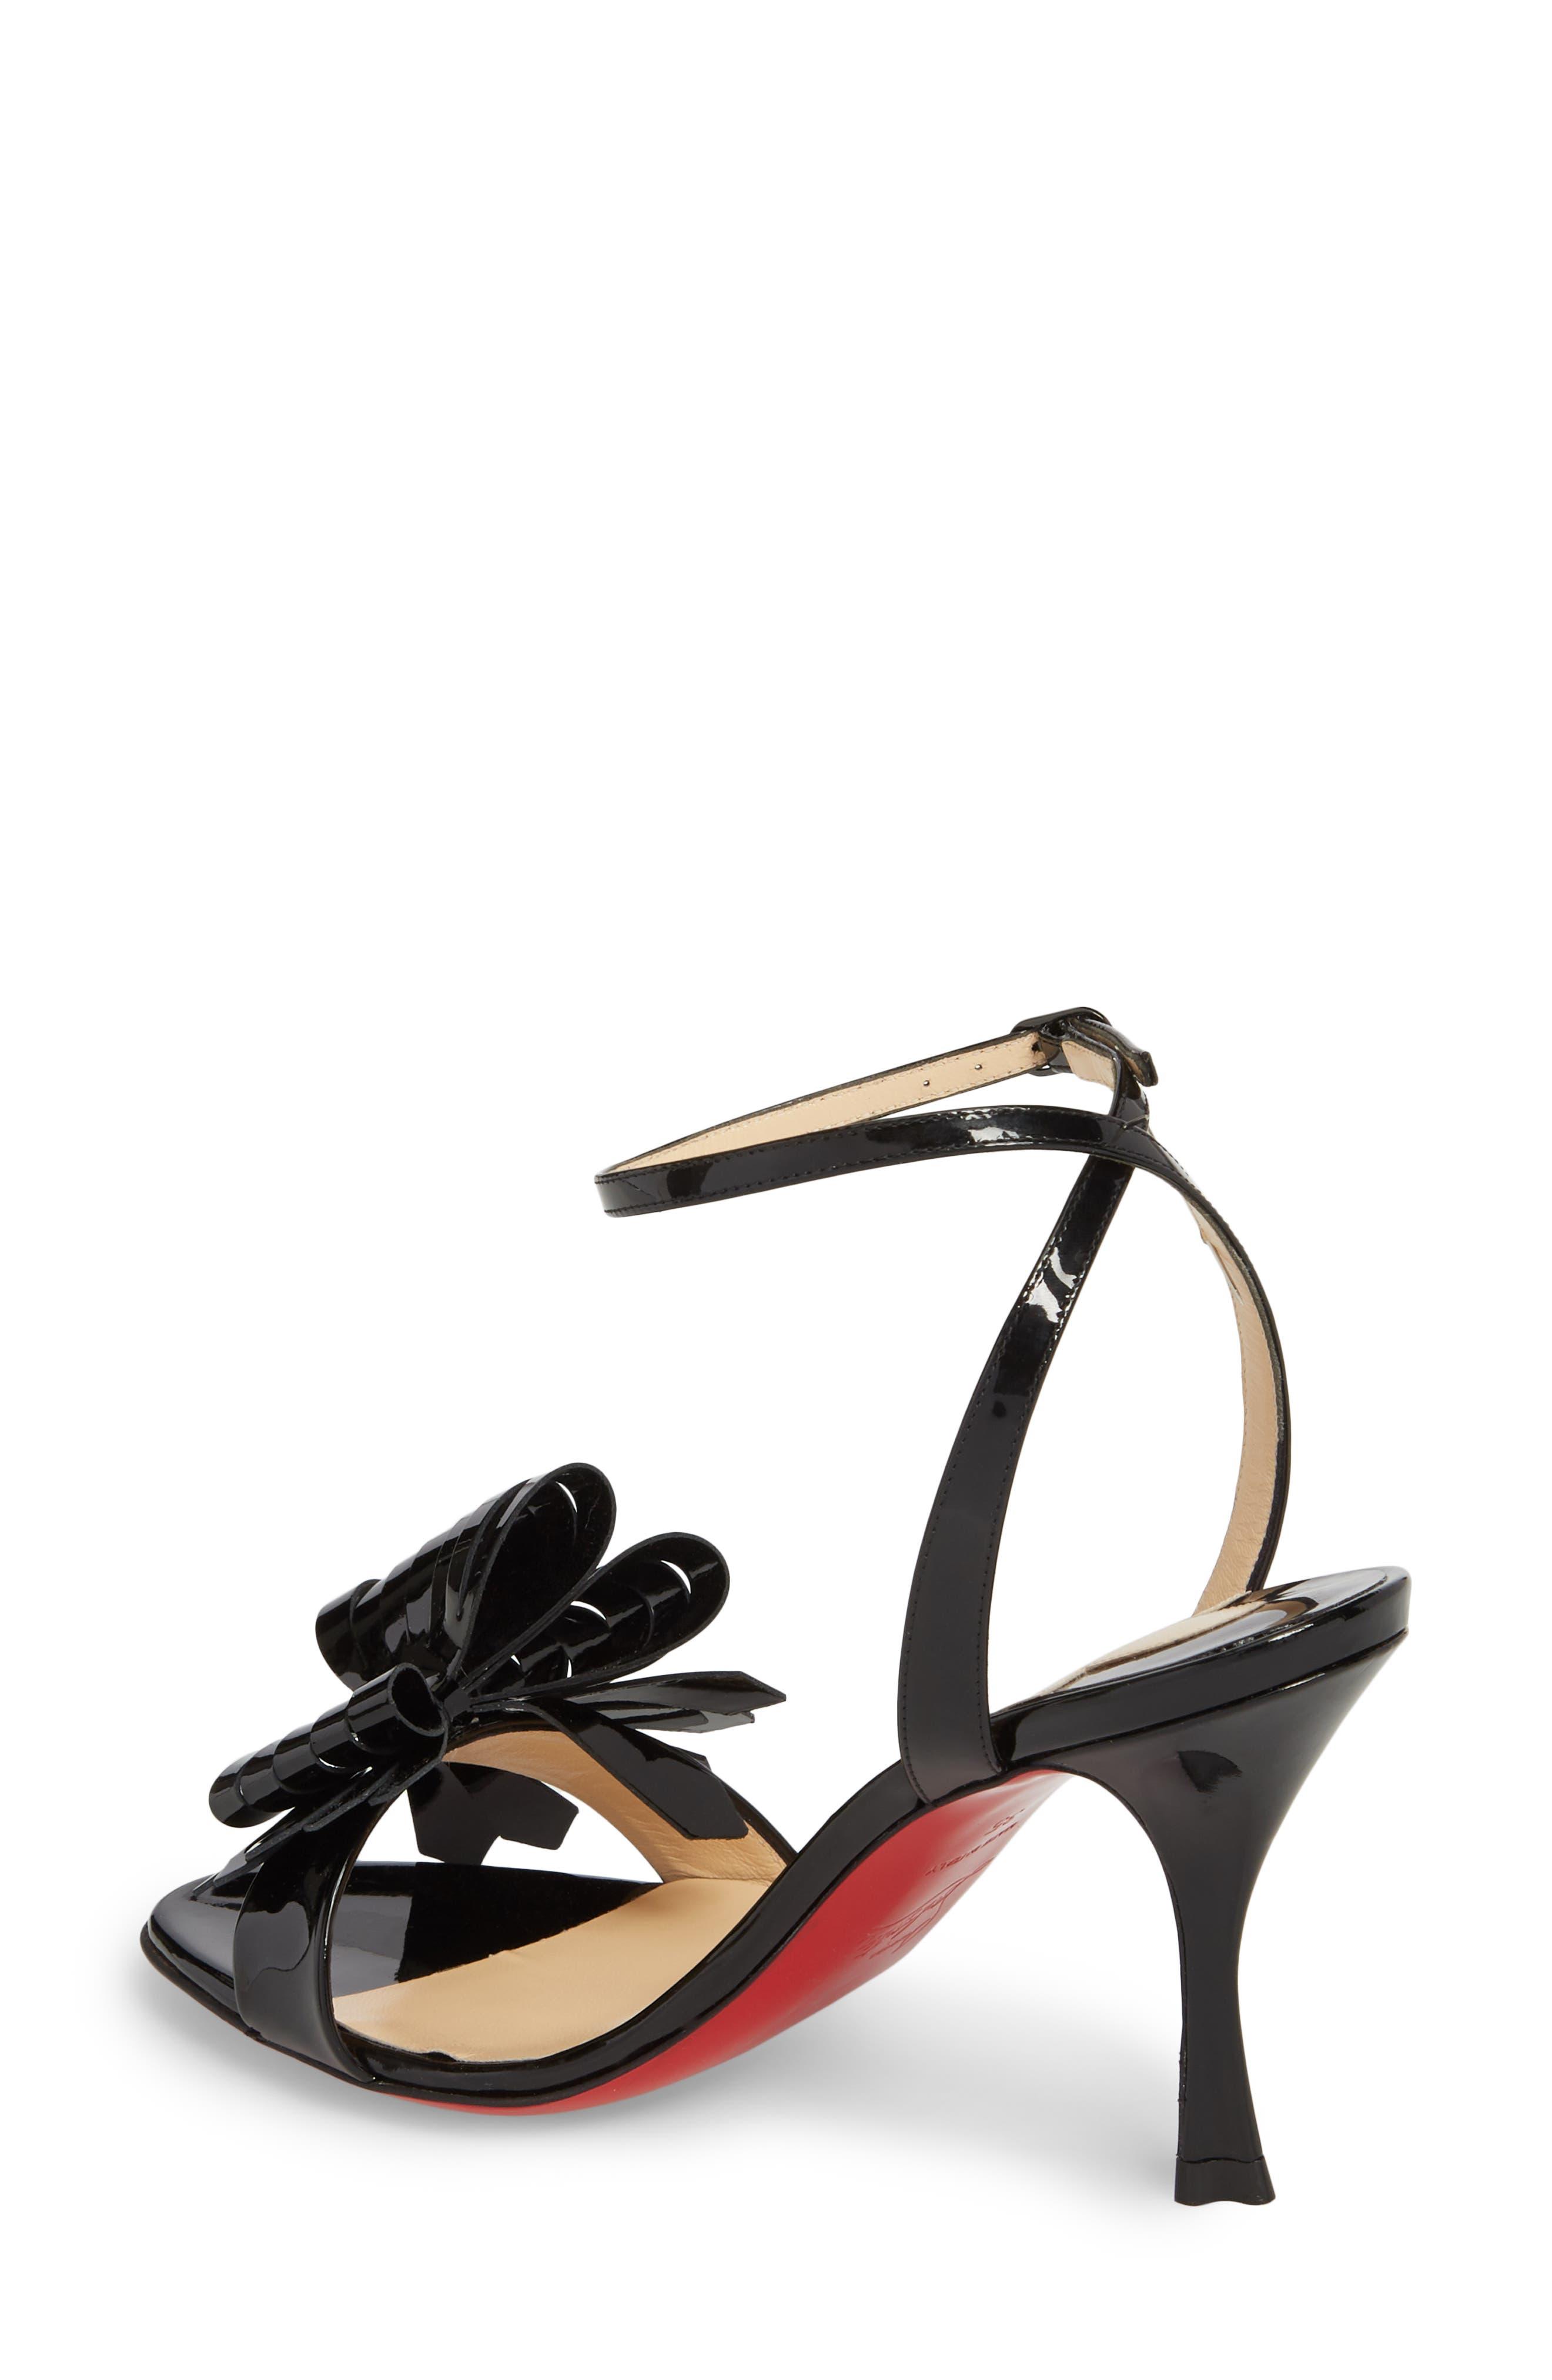 Miss Valois Bow Ankle Strap Sandal,                             Alternate thumbnail 3, color,